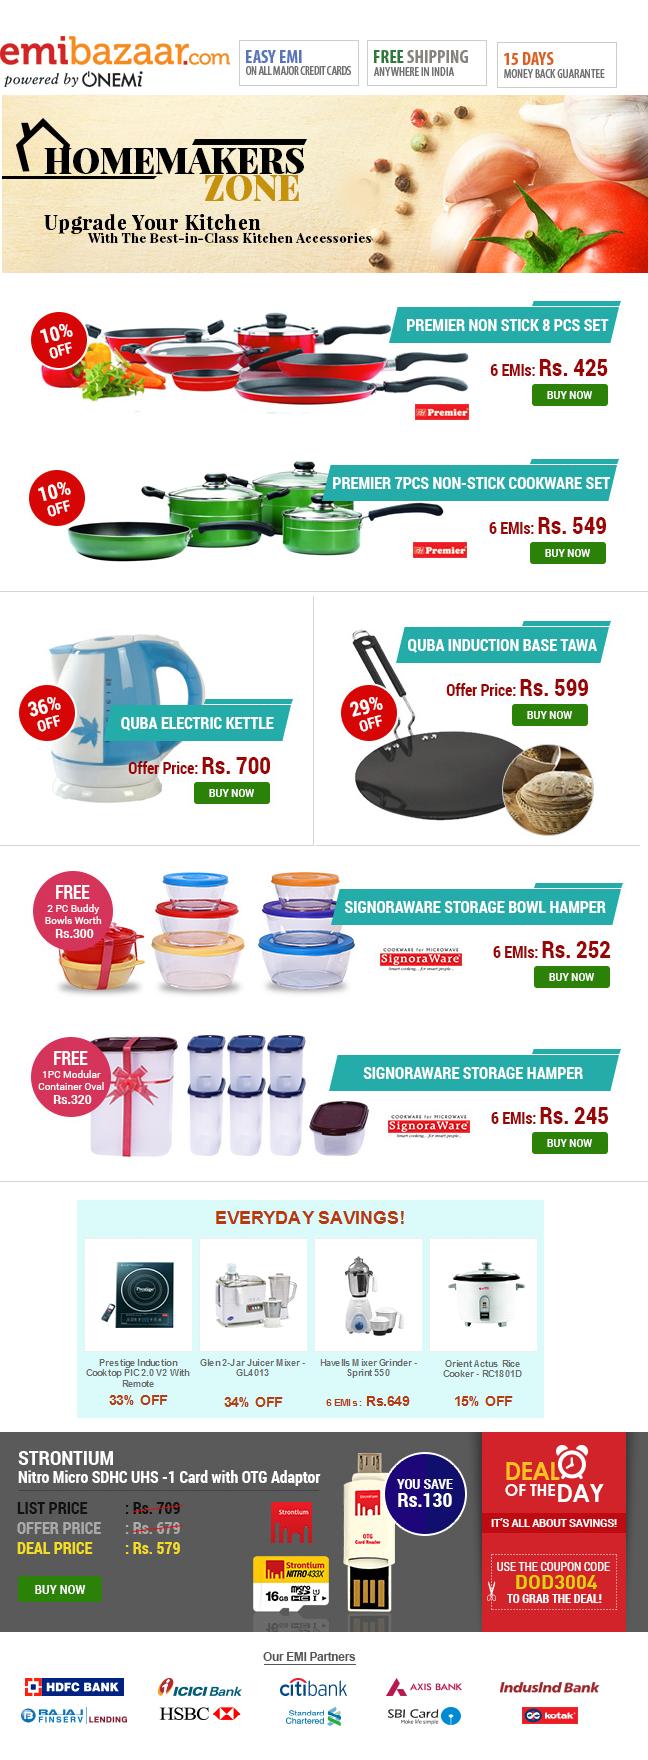 Homemakers Zone! Up to 36% OFF + Fabulous FREEBIES on Best-in-Class Kitchen Accessories! Emibazaar.com